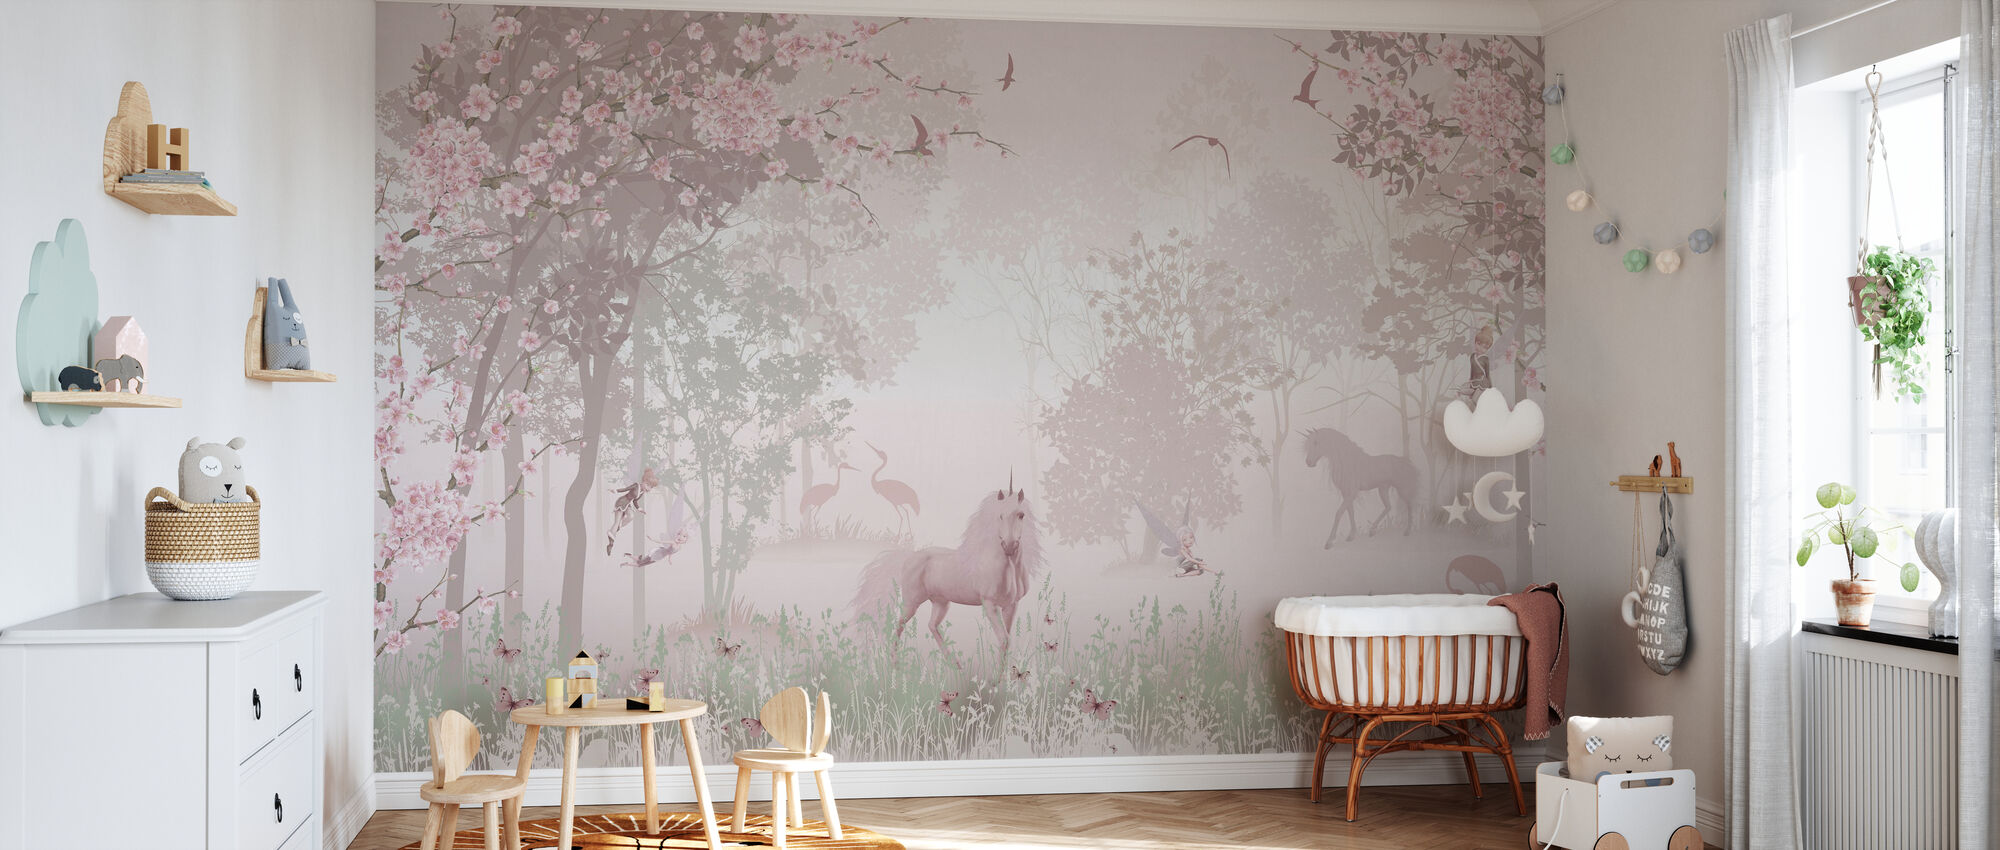 Eenhoorns in dromerig bos - Behang - Babykamer